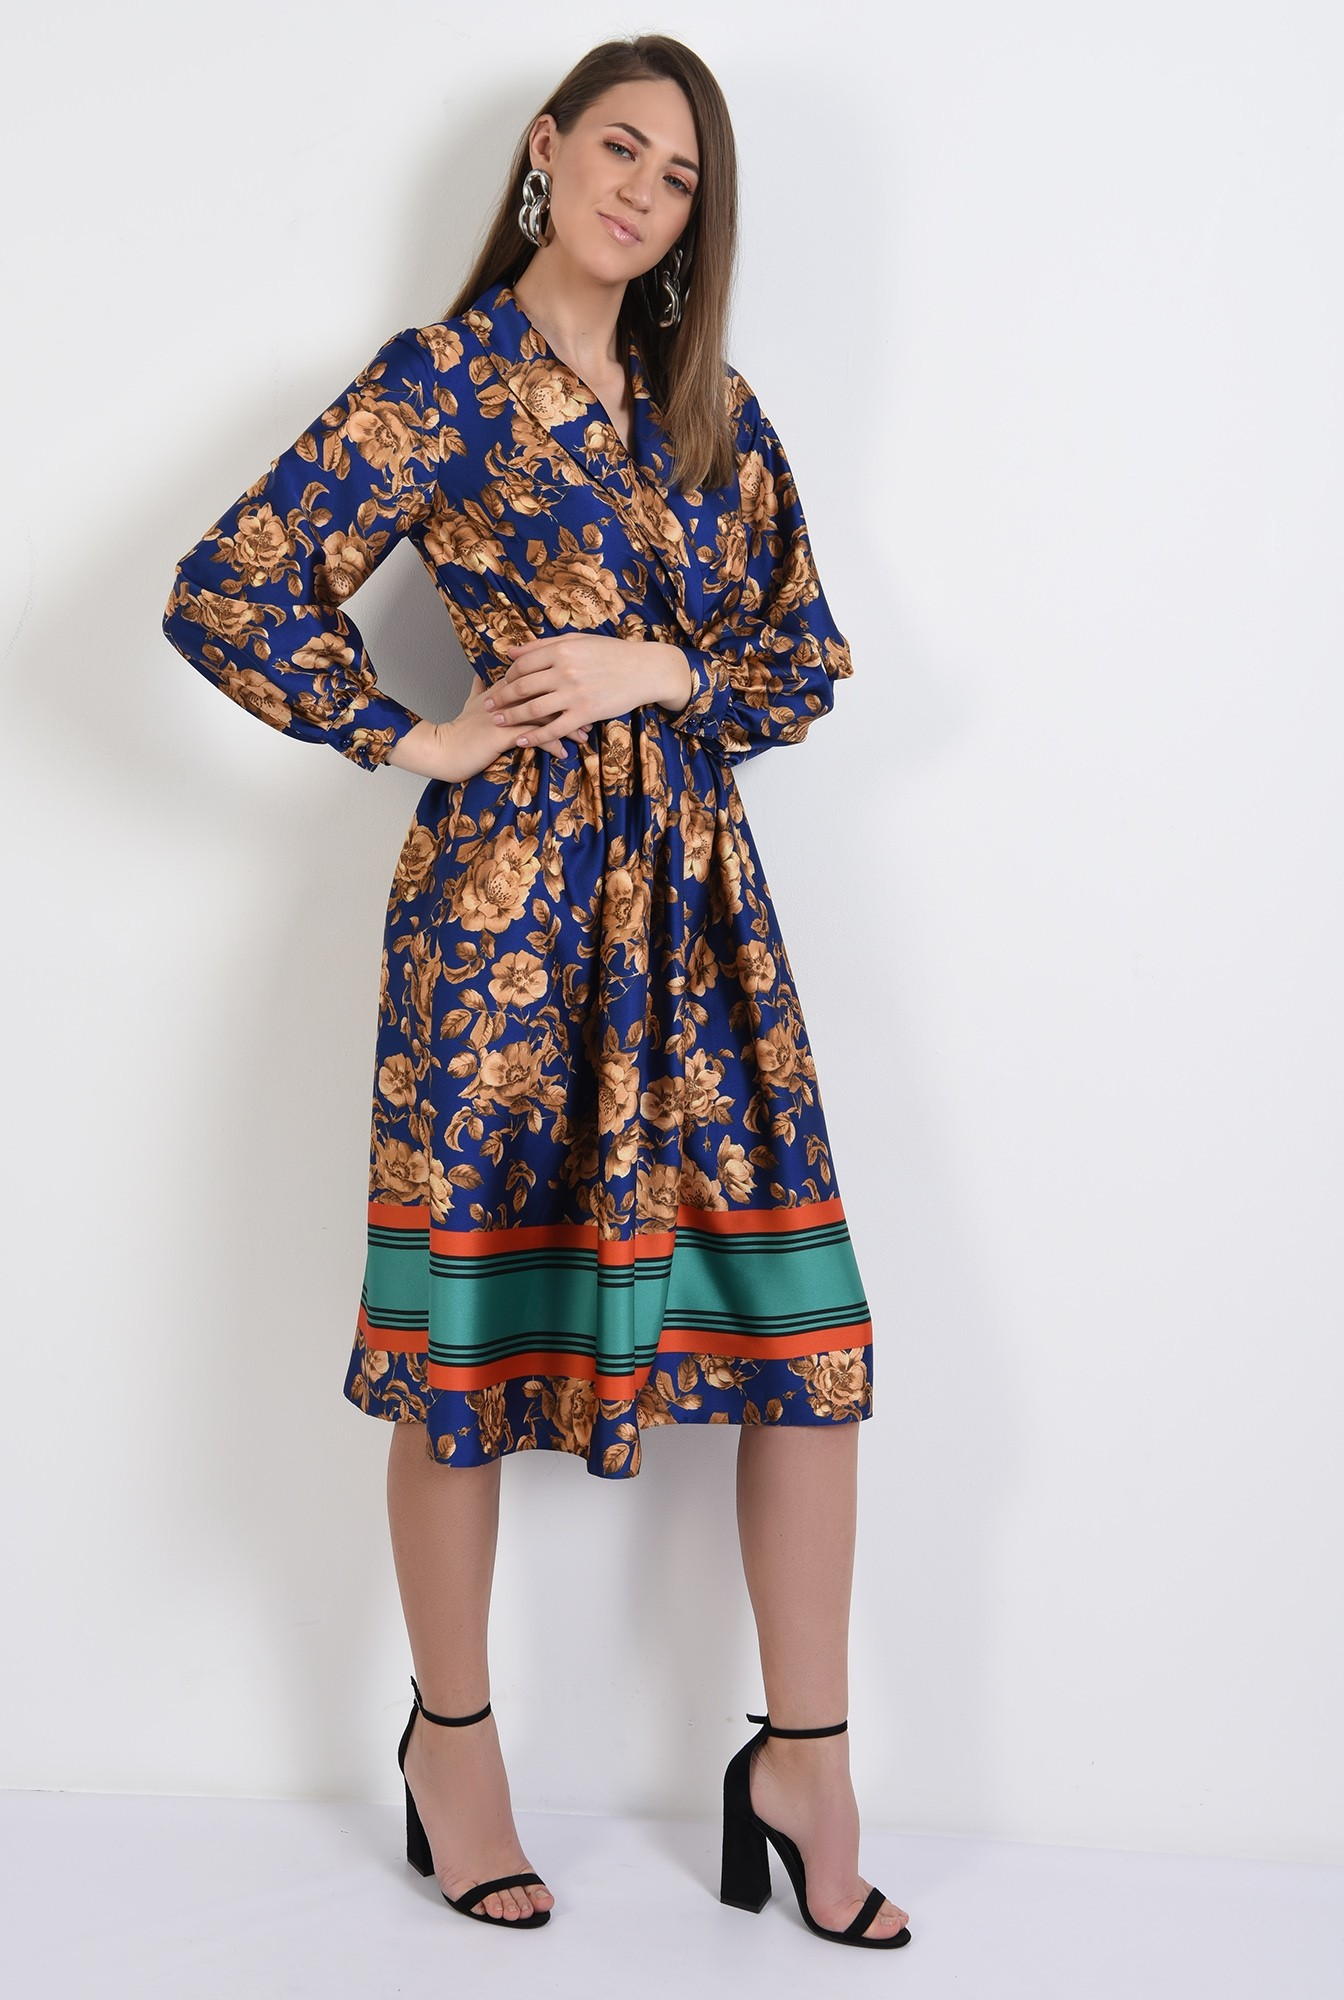 3 - 360 - rochie midi, evazata, satin, cu imprimeu floral